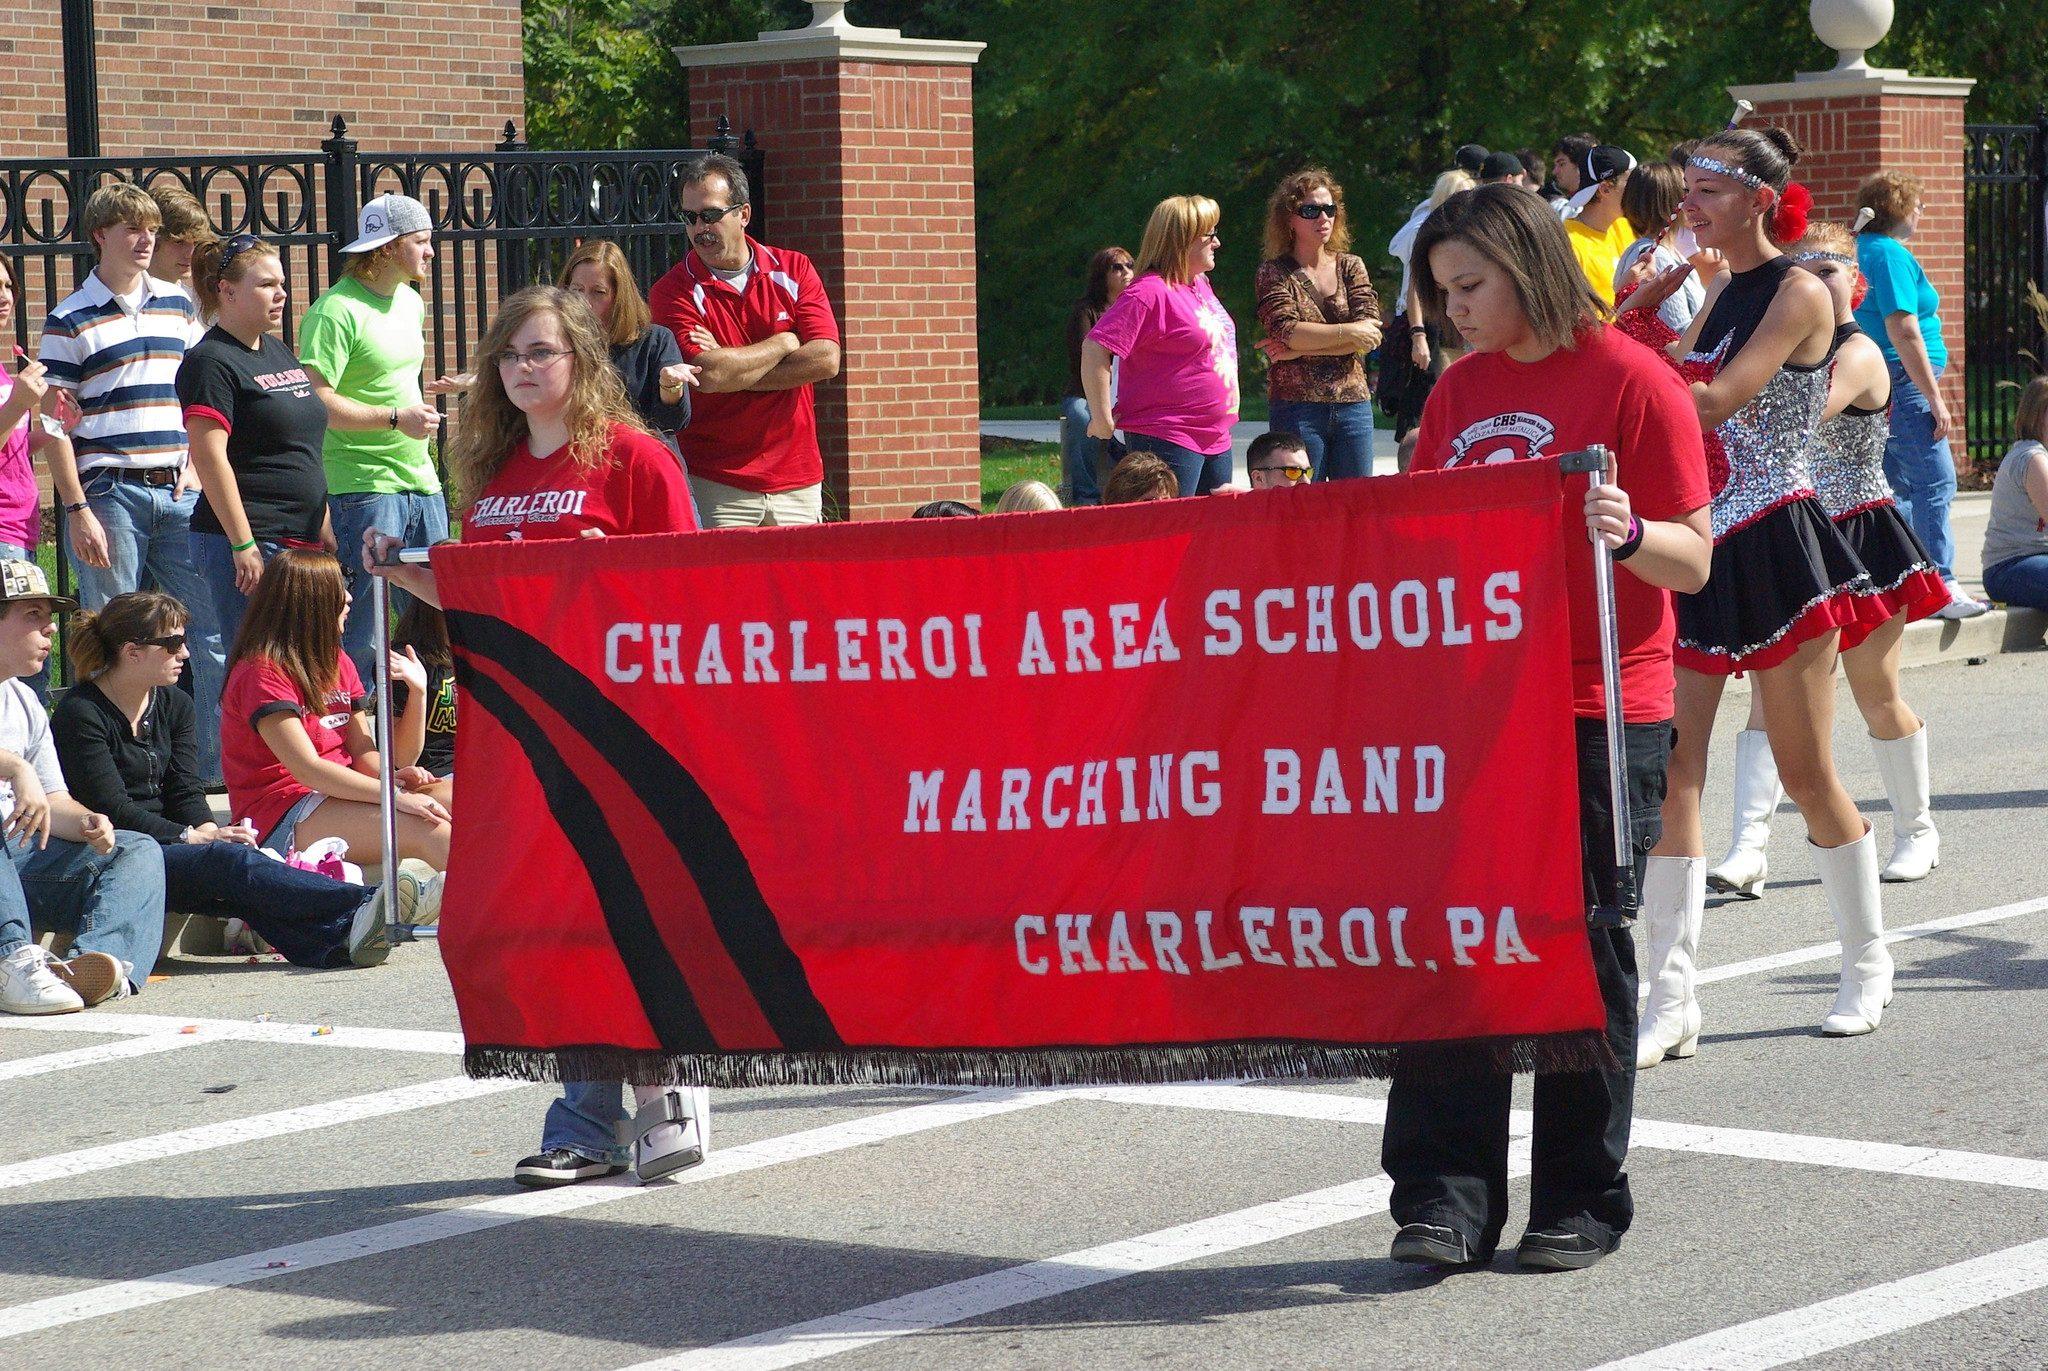 school-banner-parade